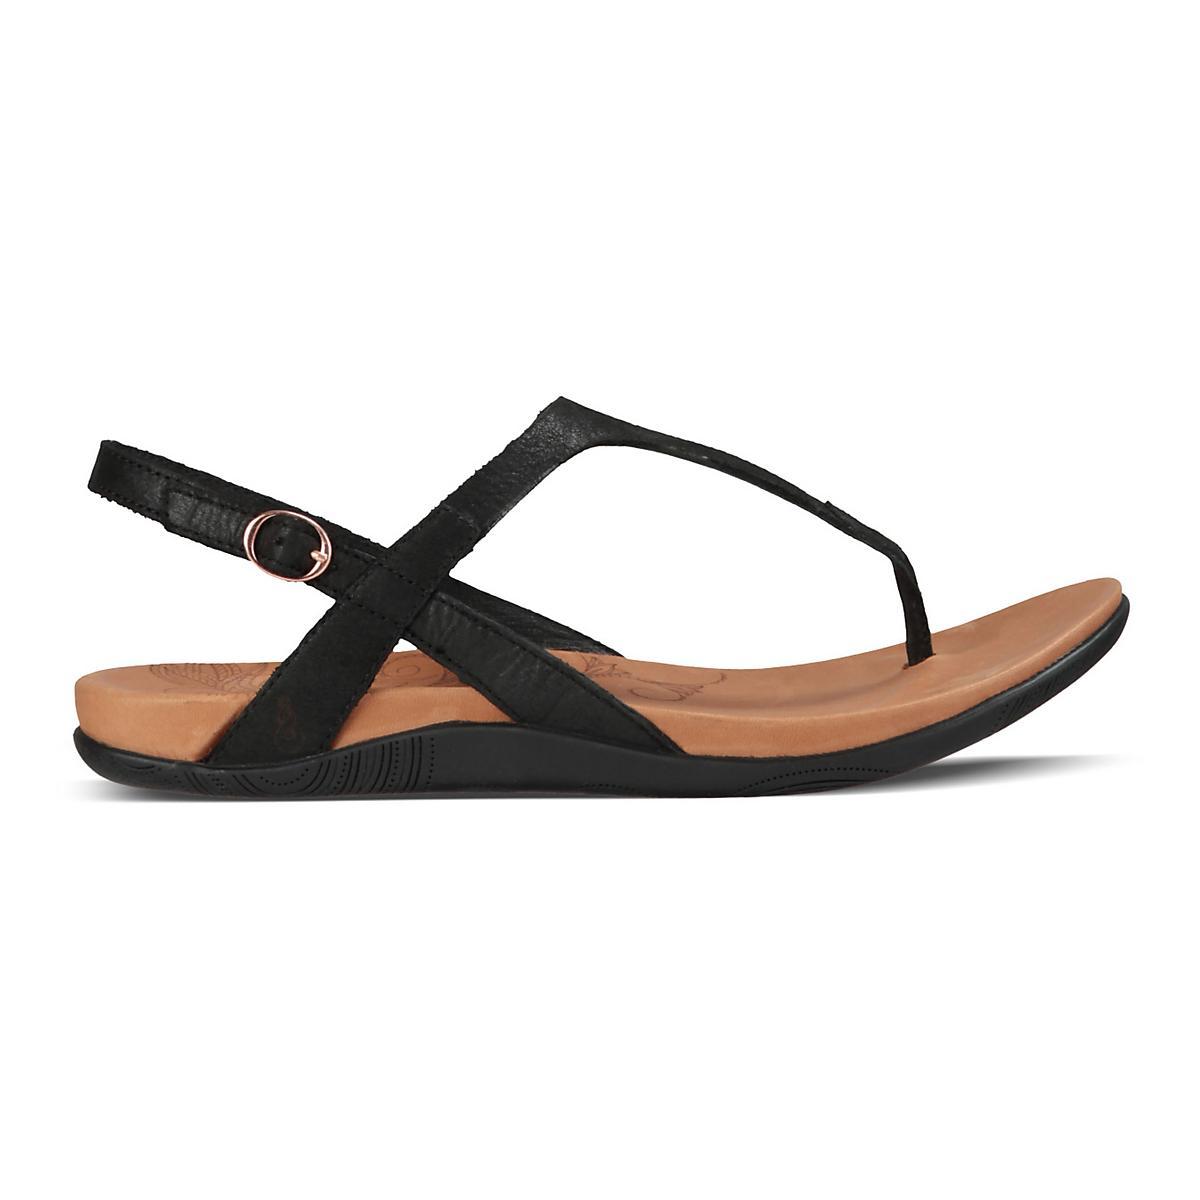 c84142579 Womens Ahnu Salena Sandals Shoe at Road Runner Sports